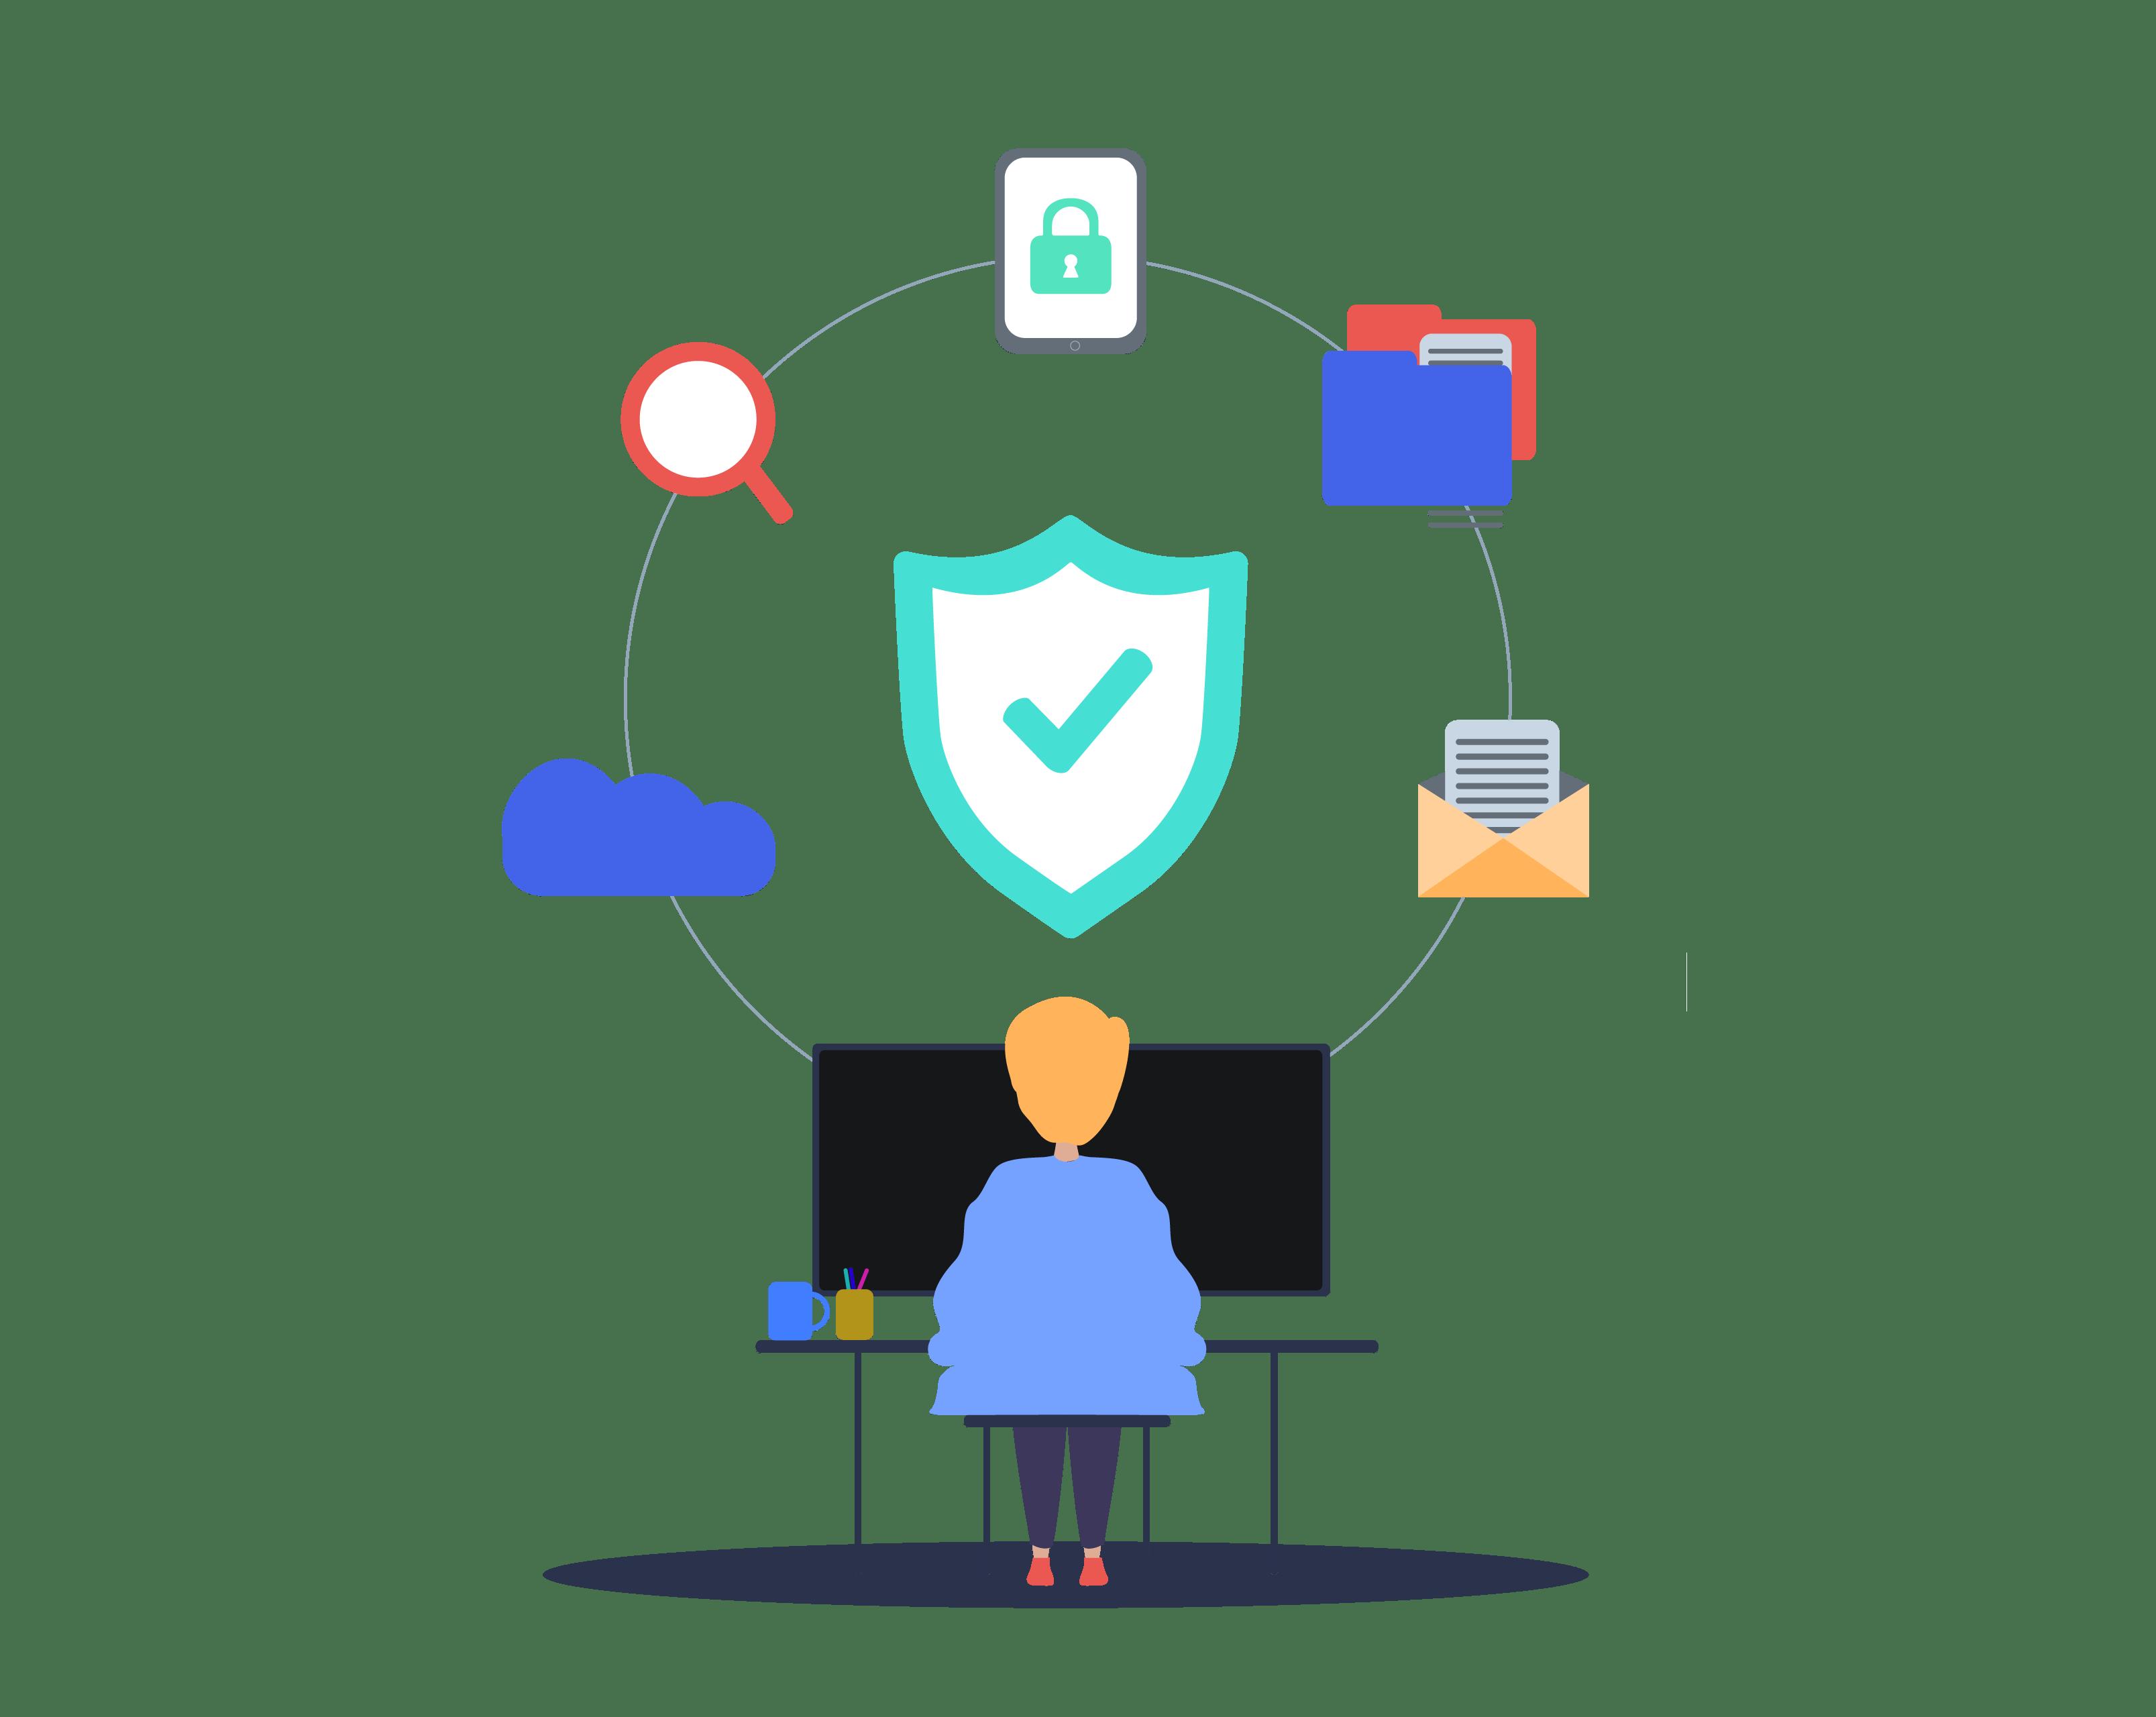 node js security